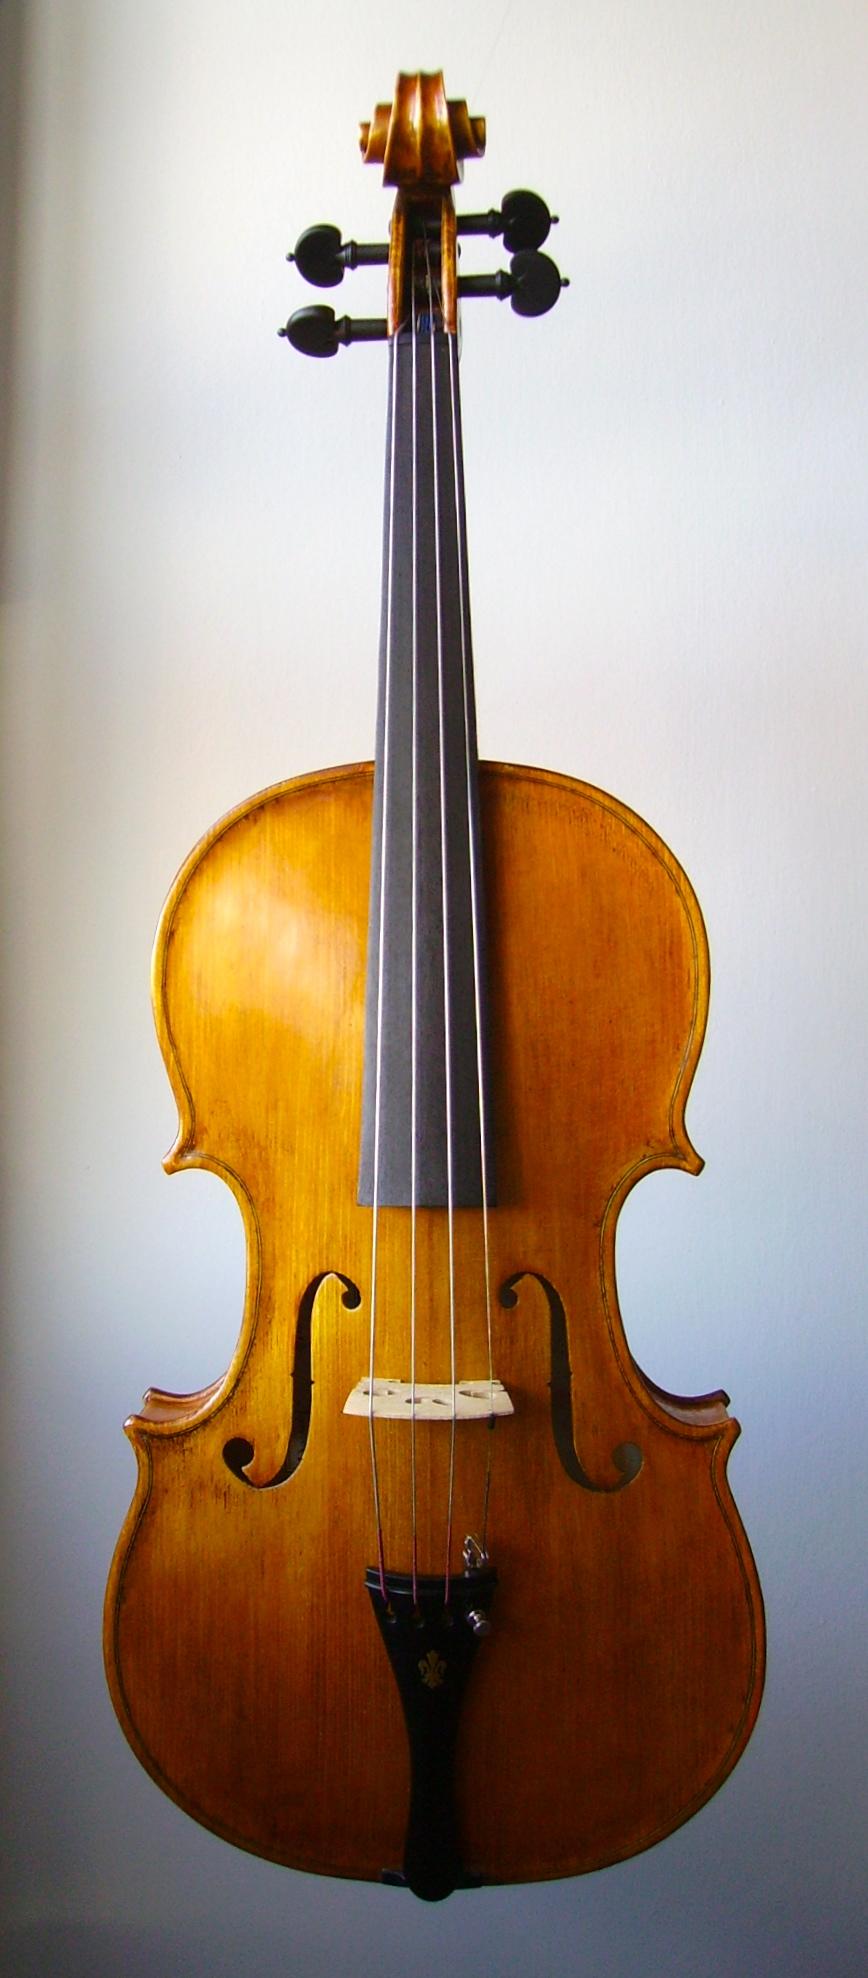 Viola 41 cm